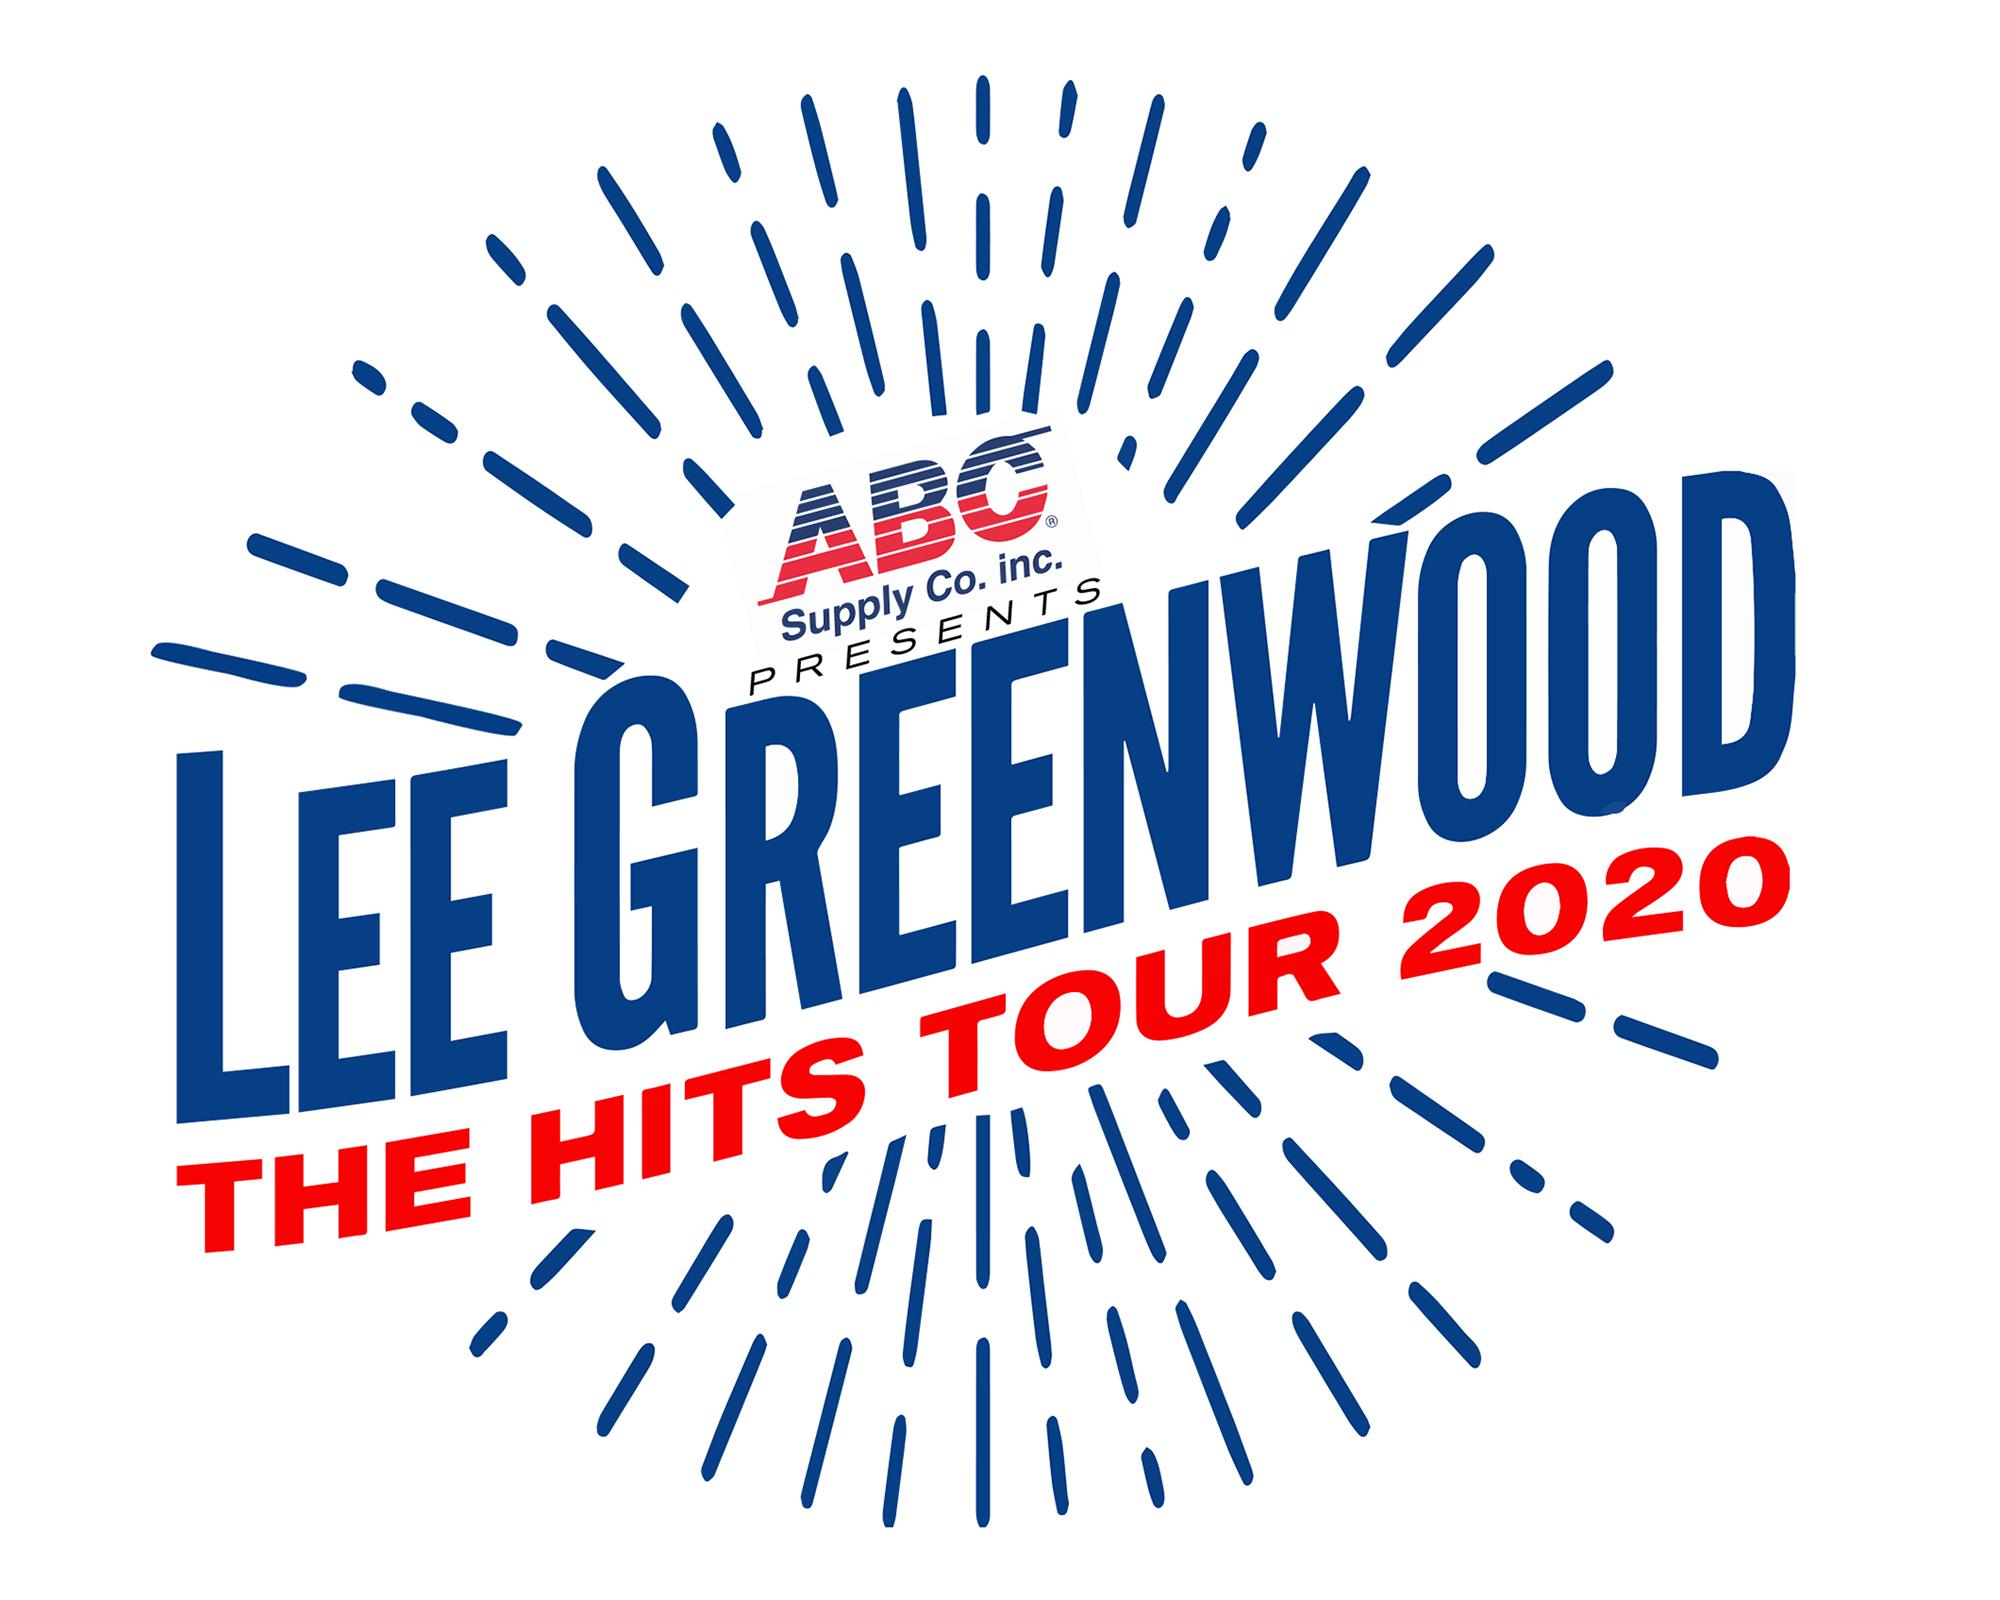 LeeGreenwood_TheHitsTour2020_logo_2000px.jpg